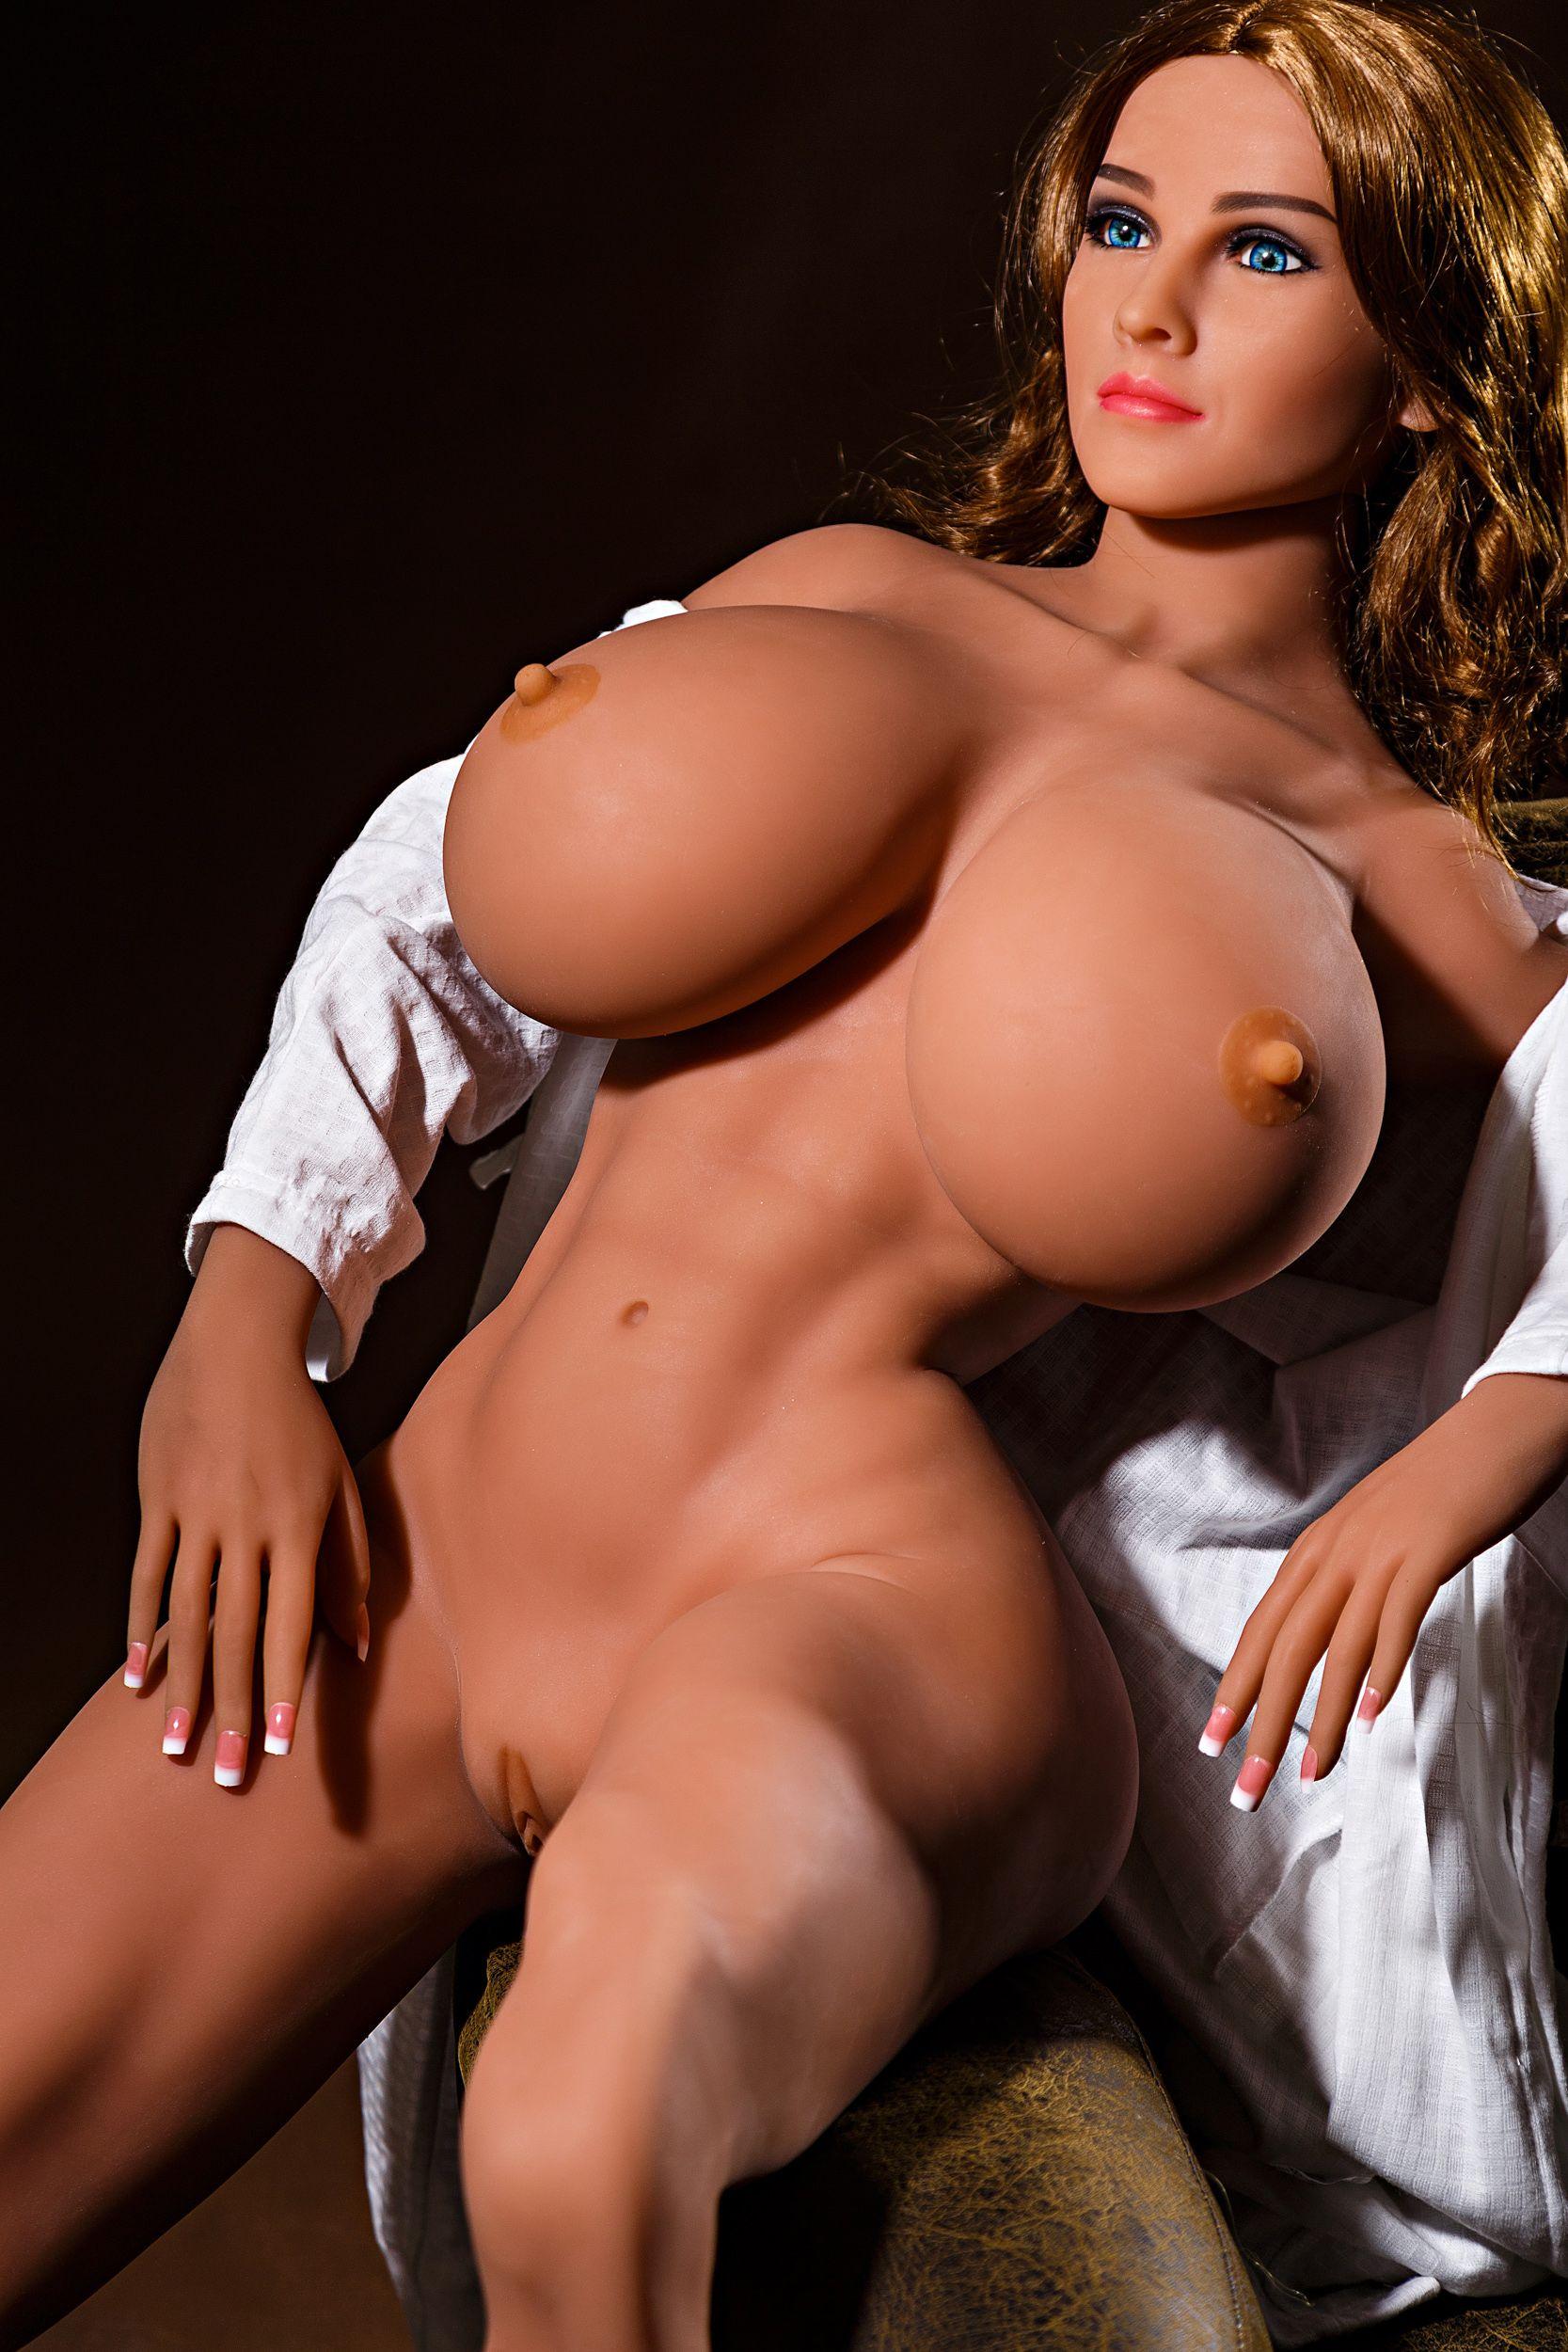 Hinata sex hot picher